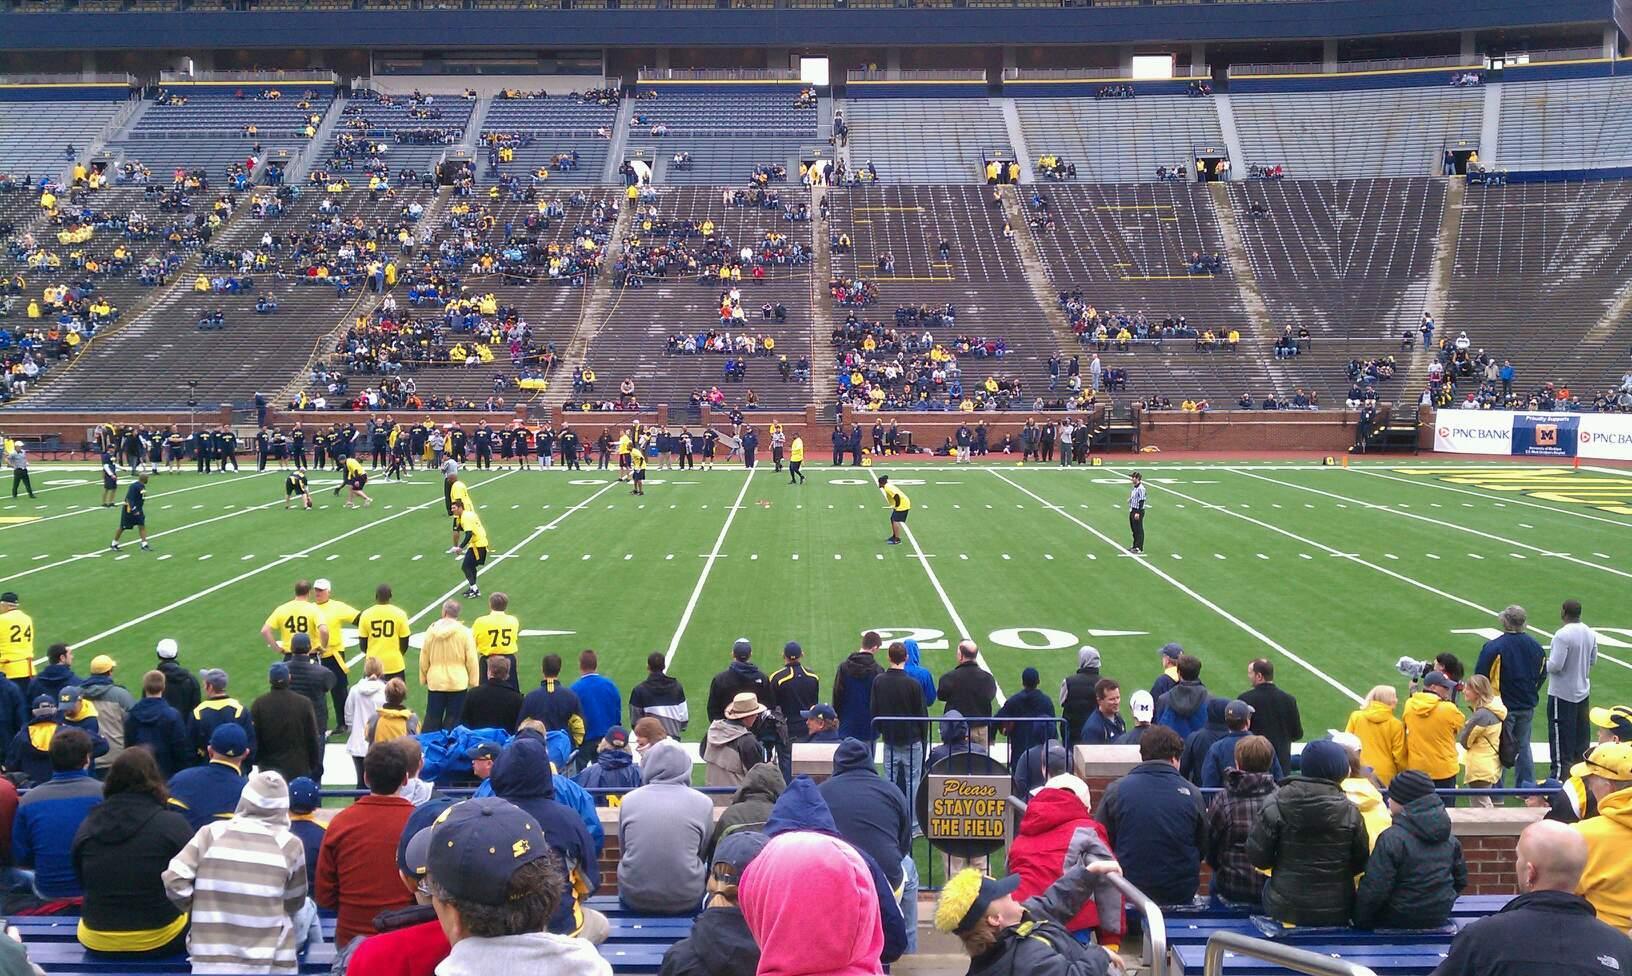 Michigan Stadium Section 43 Row 14 Seat 12